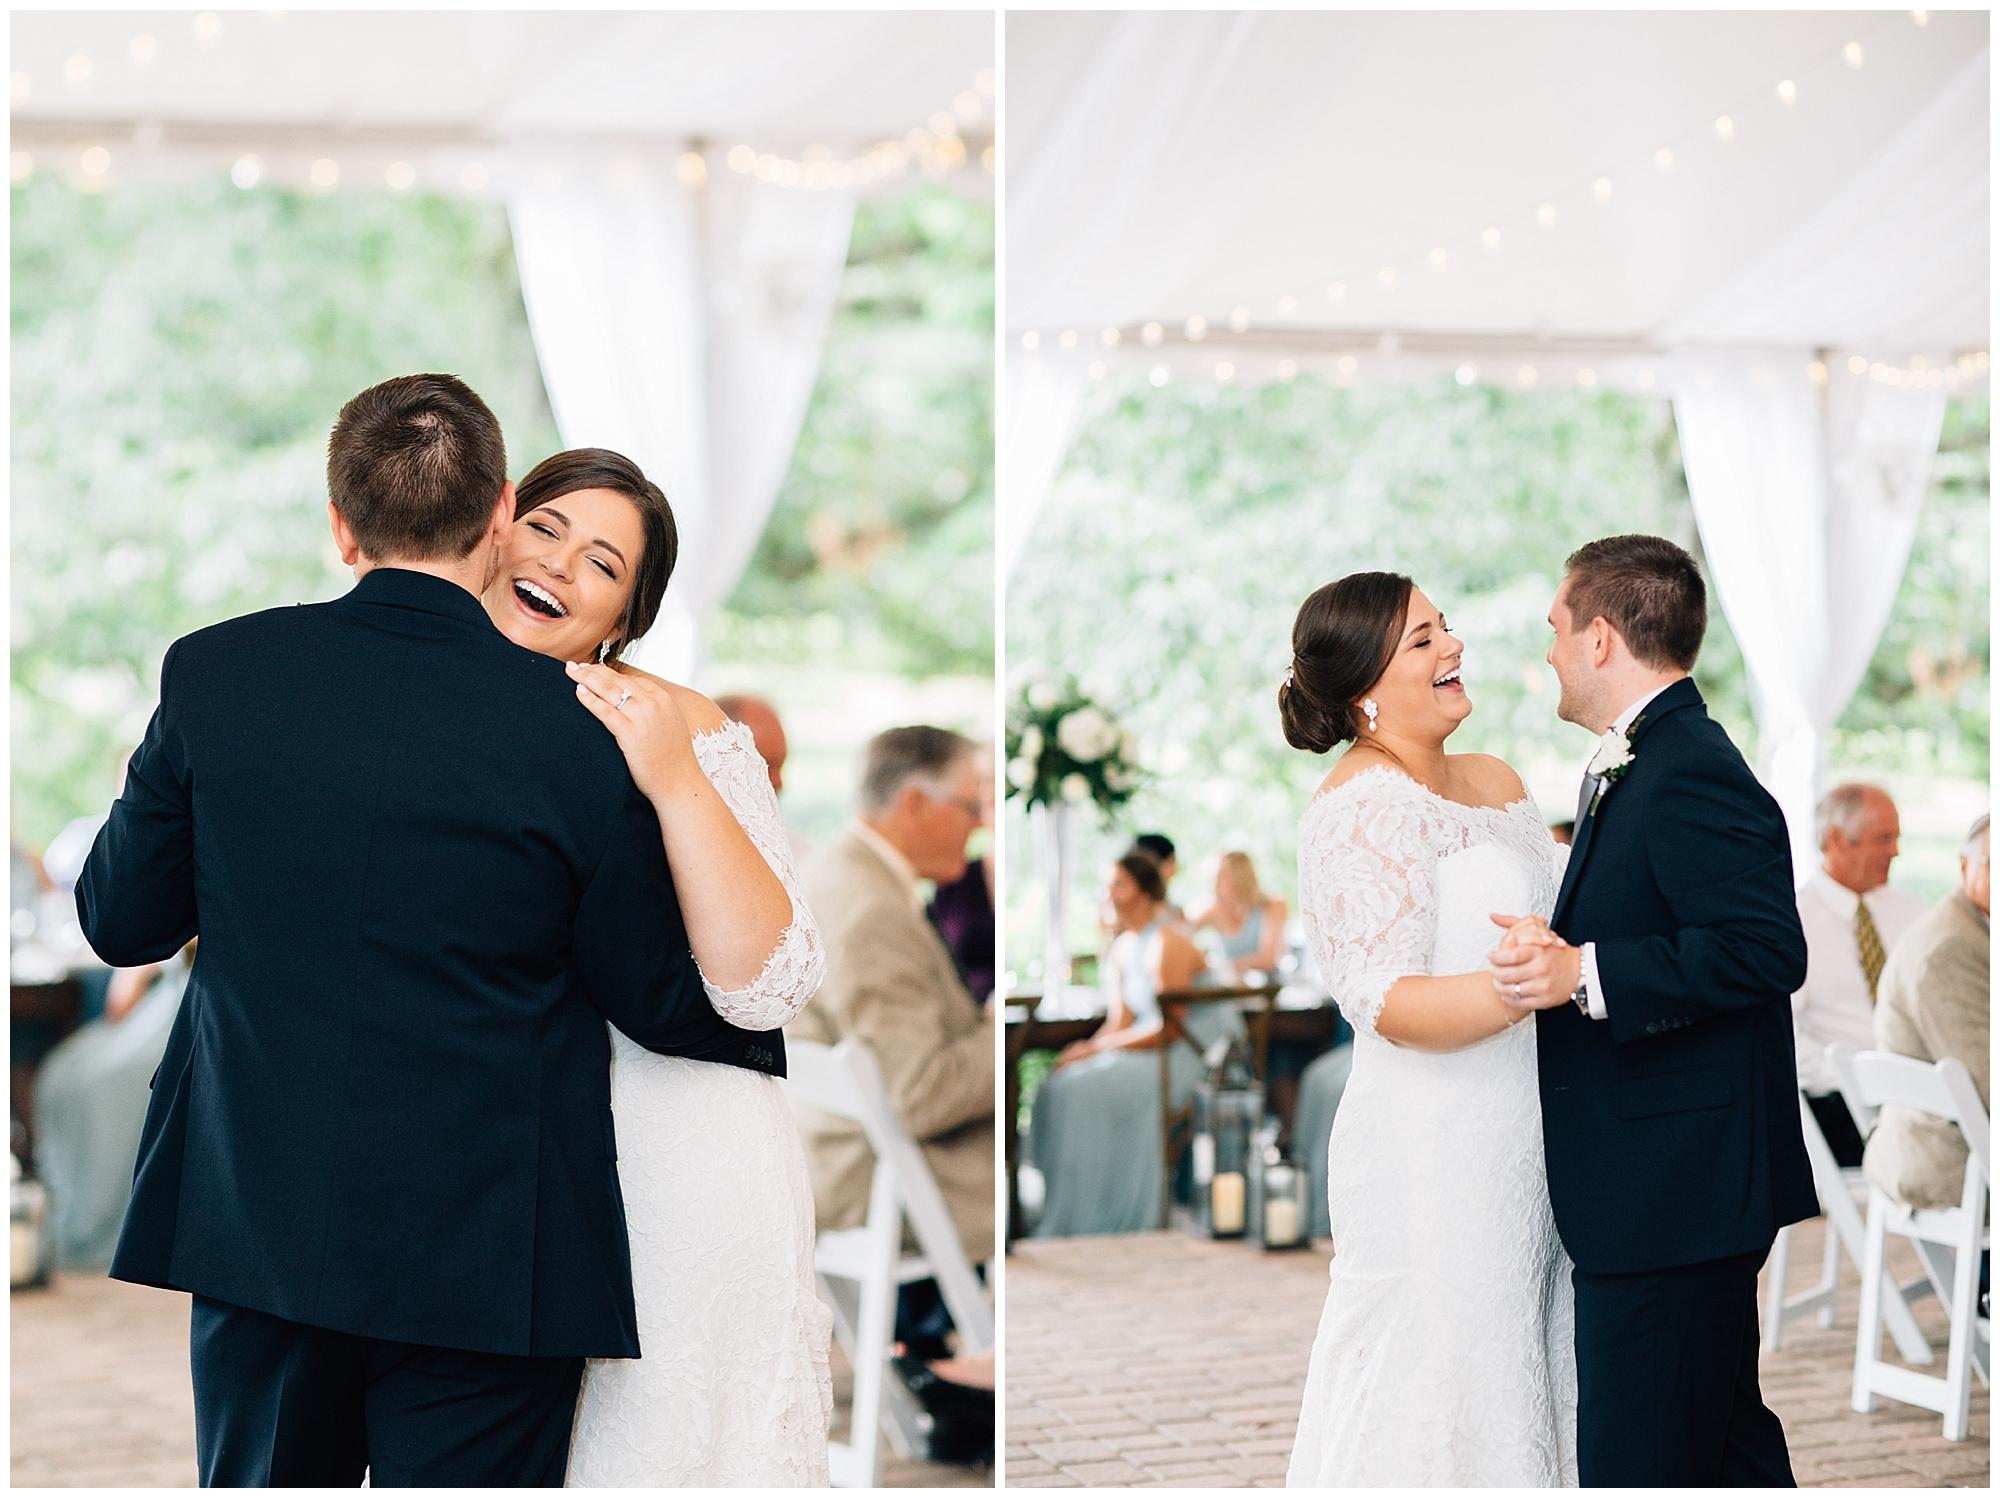 Oaks-at-salem-wedding-apex-photography-90.jpg